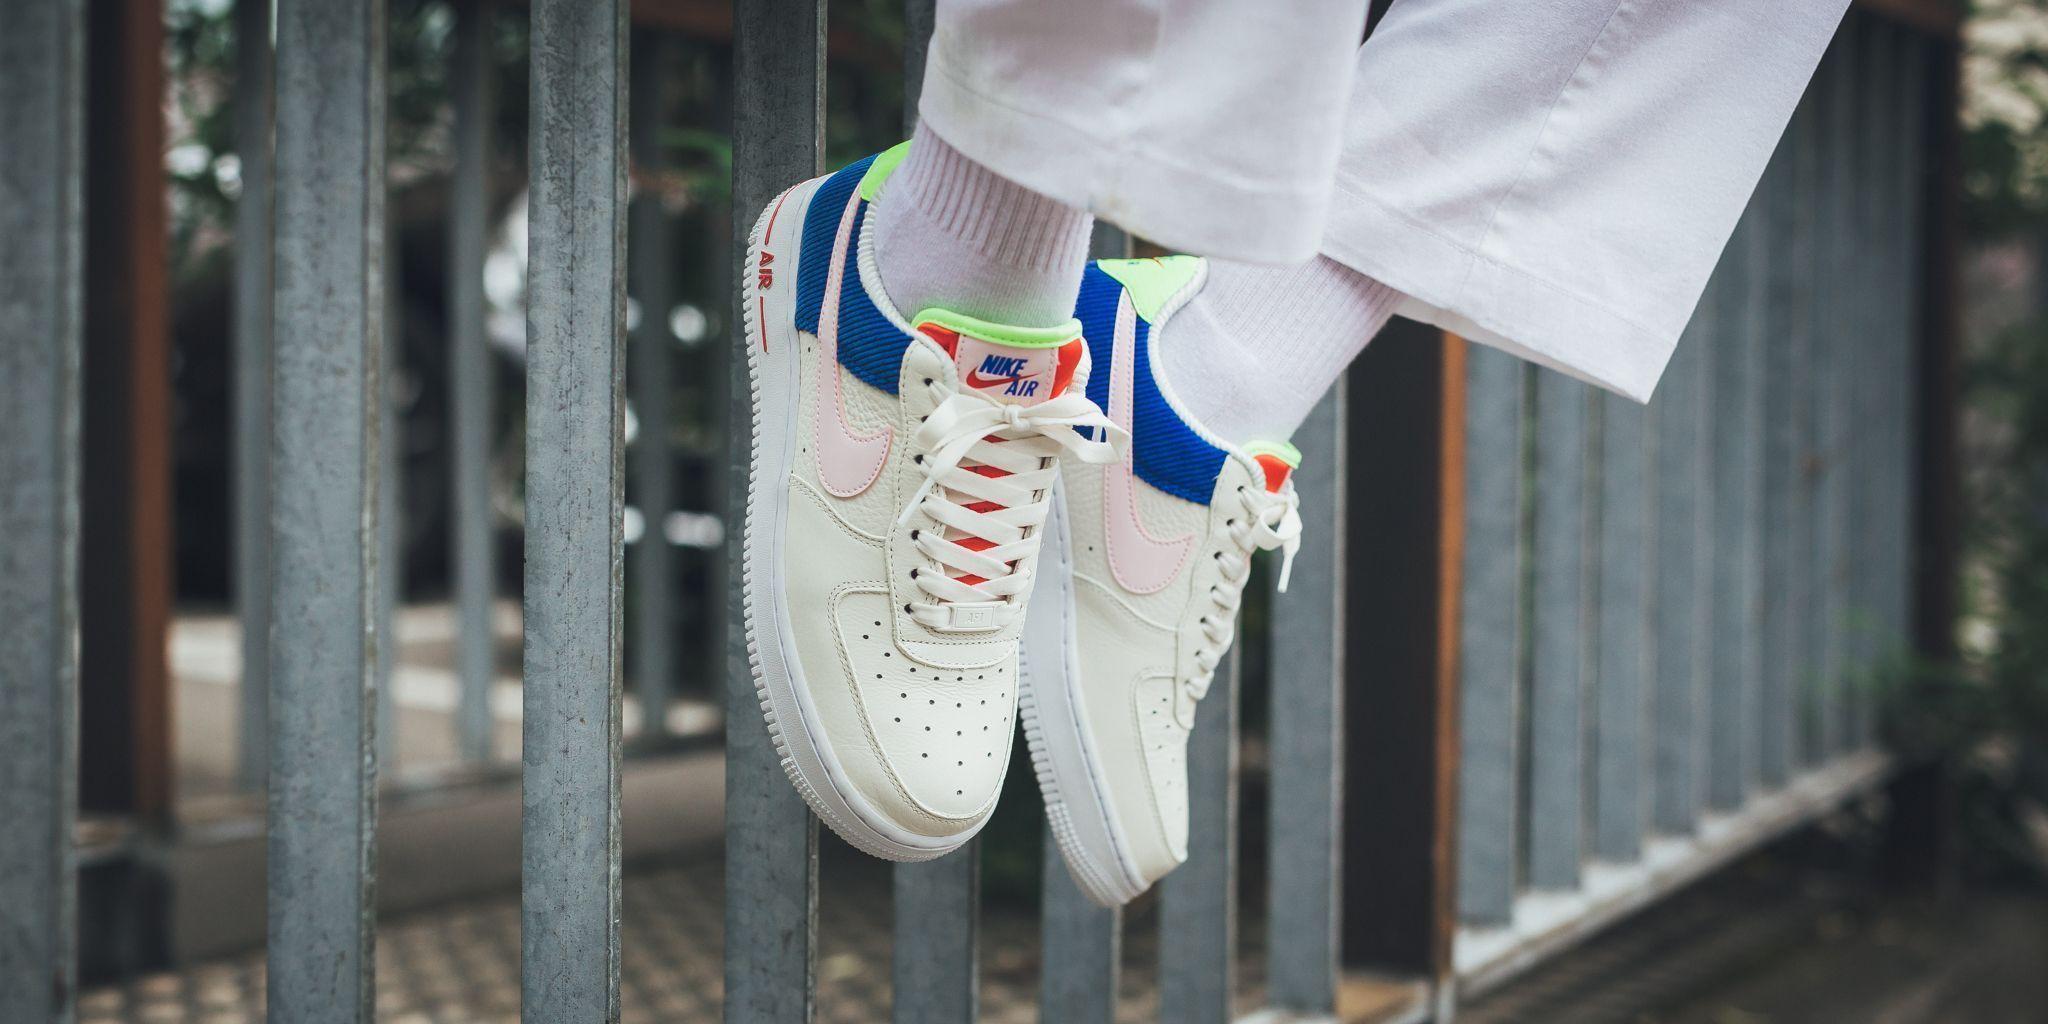 Nike Wmns Air Force 1 Corduroy Pack Lo 'Panache'